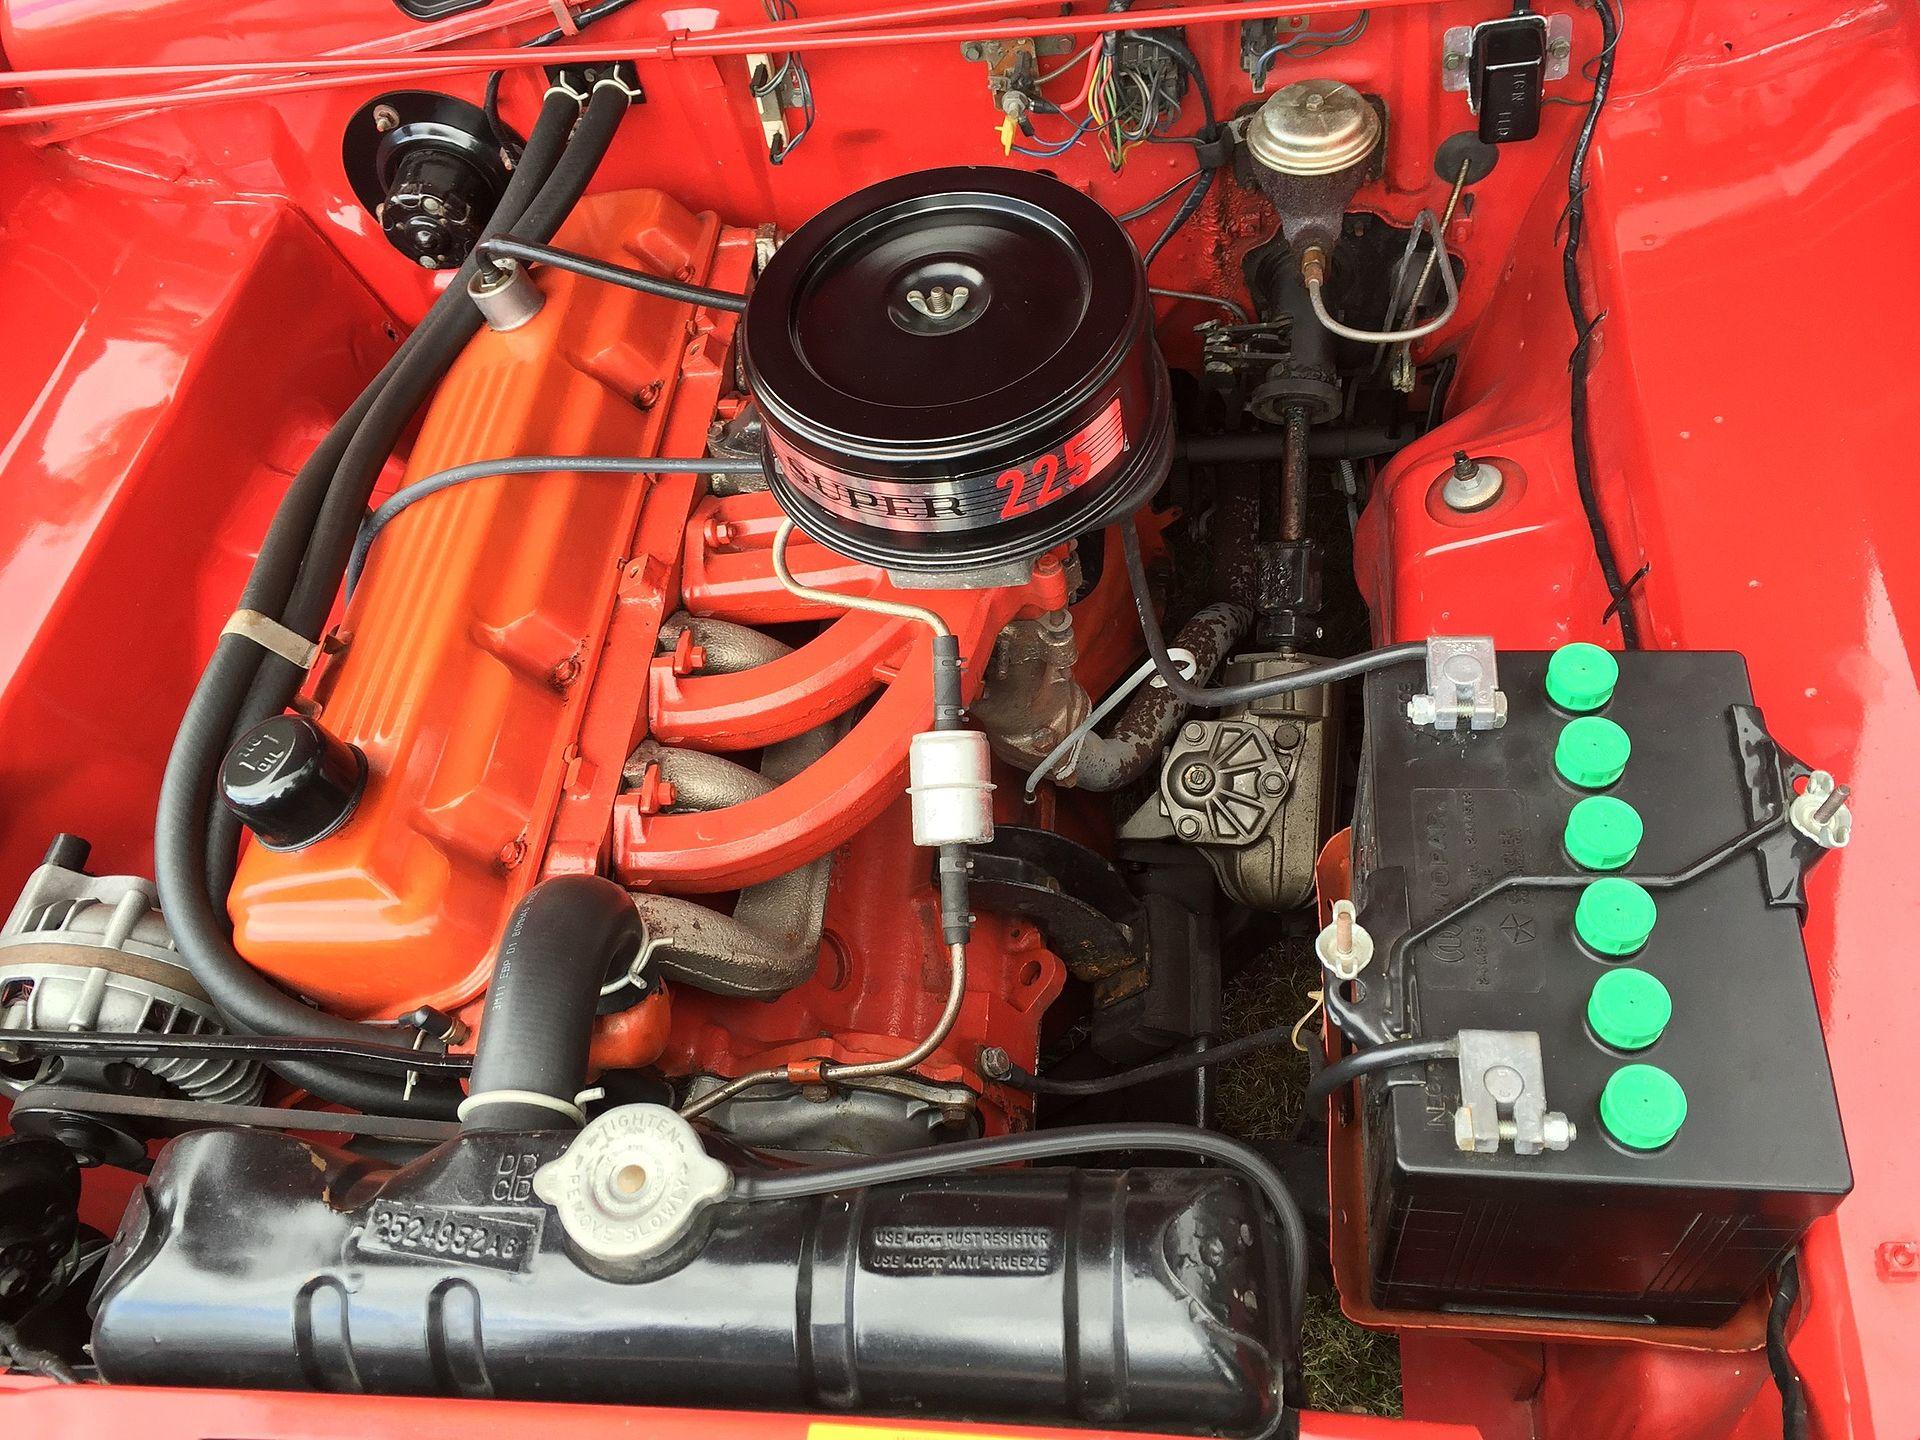 1968 Barracuda Wiring Diagram Chrysler Slant 6 Engine Wikipedia